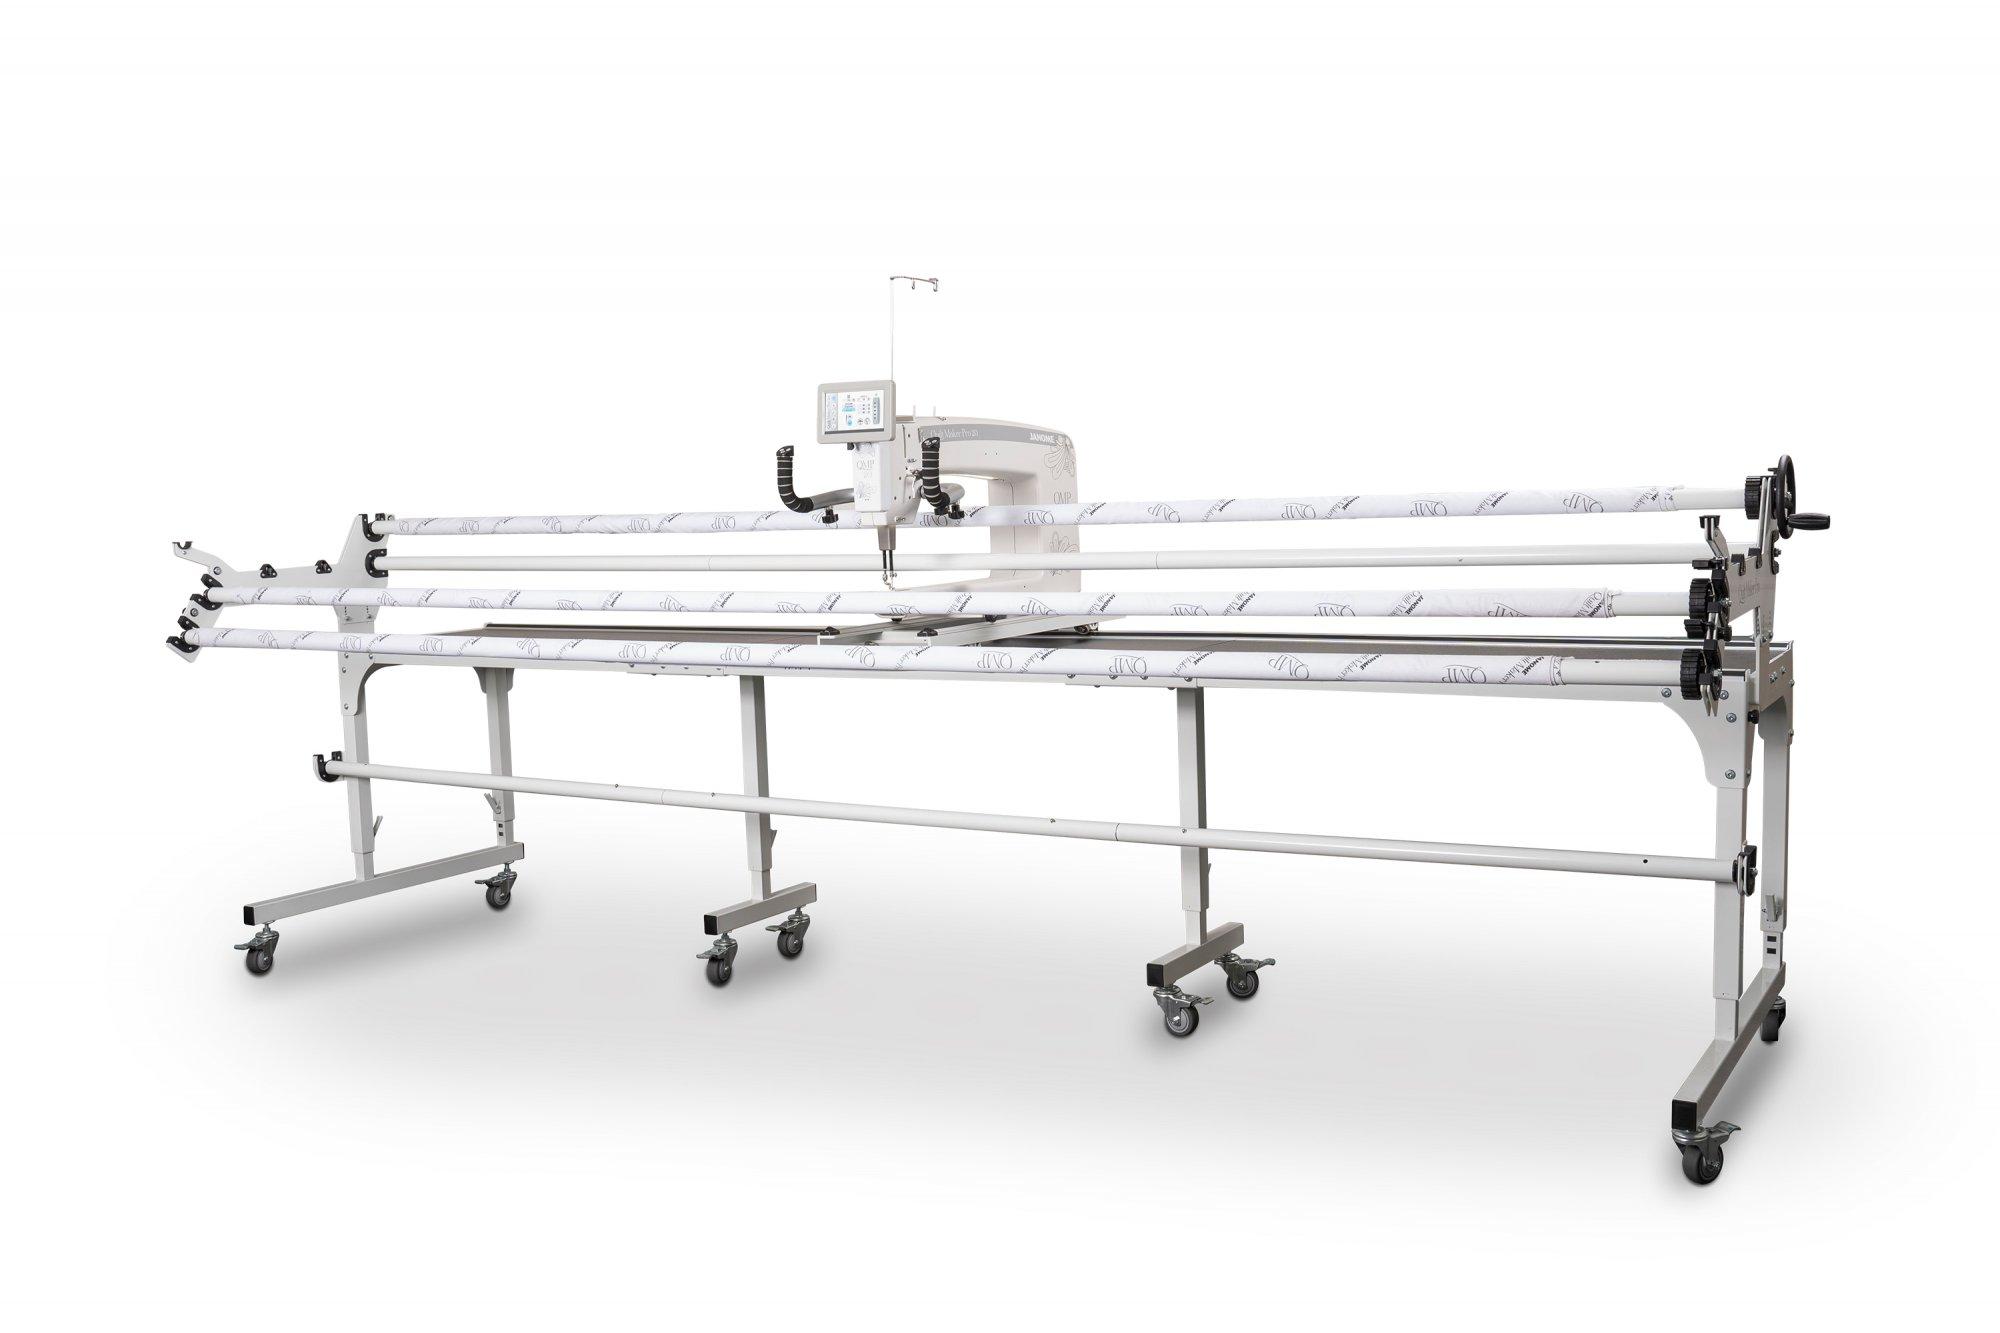 Janome Quiltmaker Pro 20 (12ft Frame)